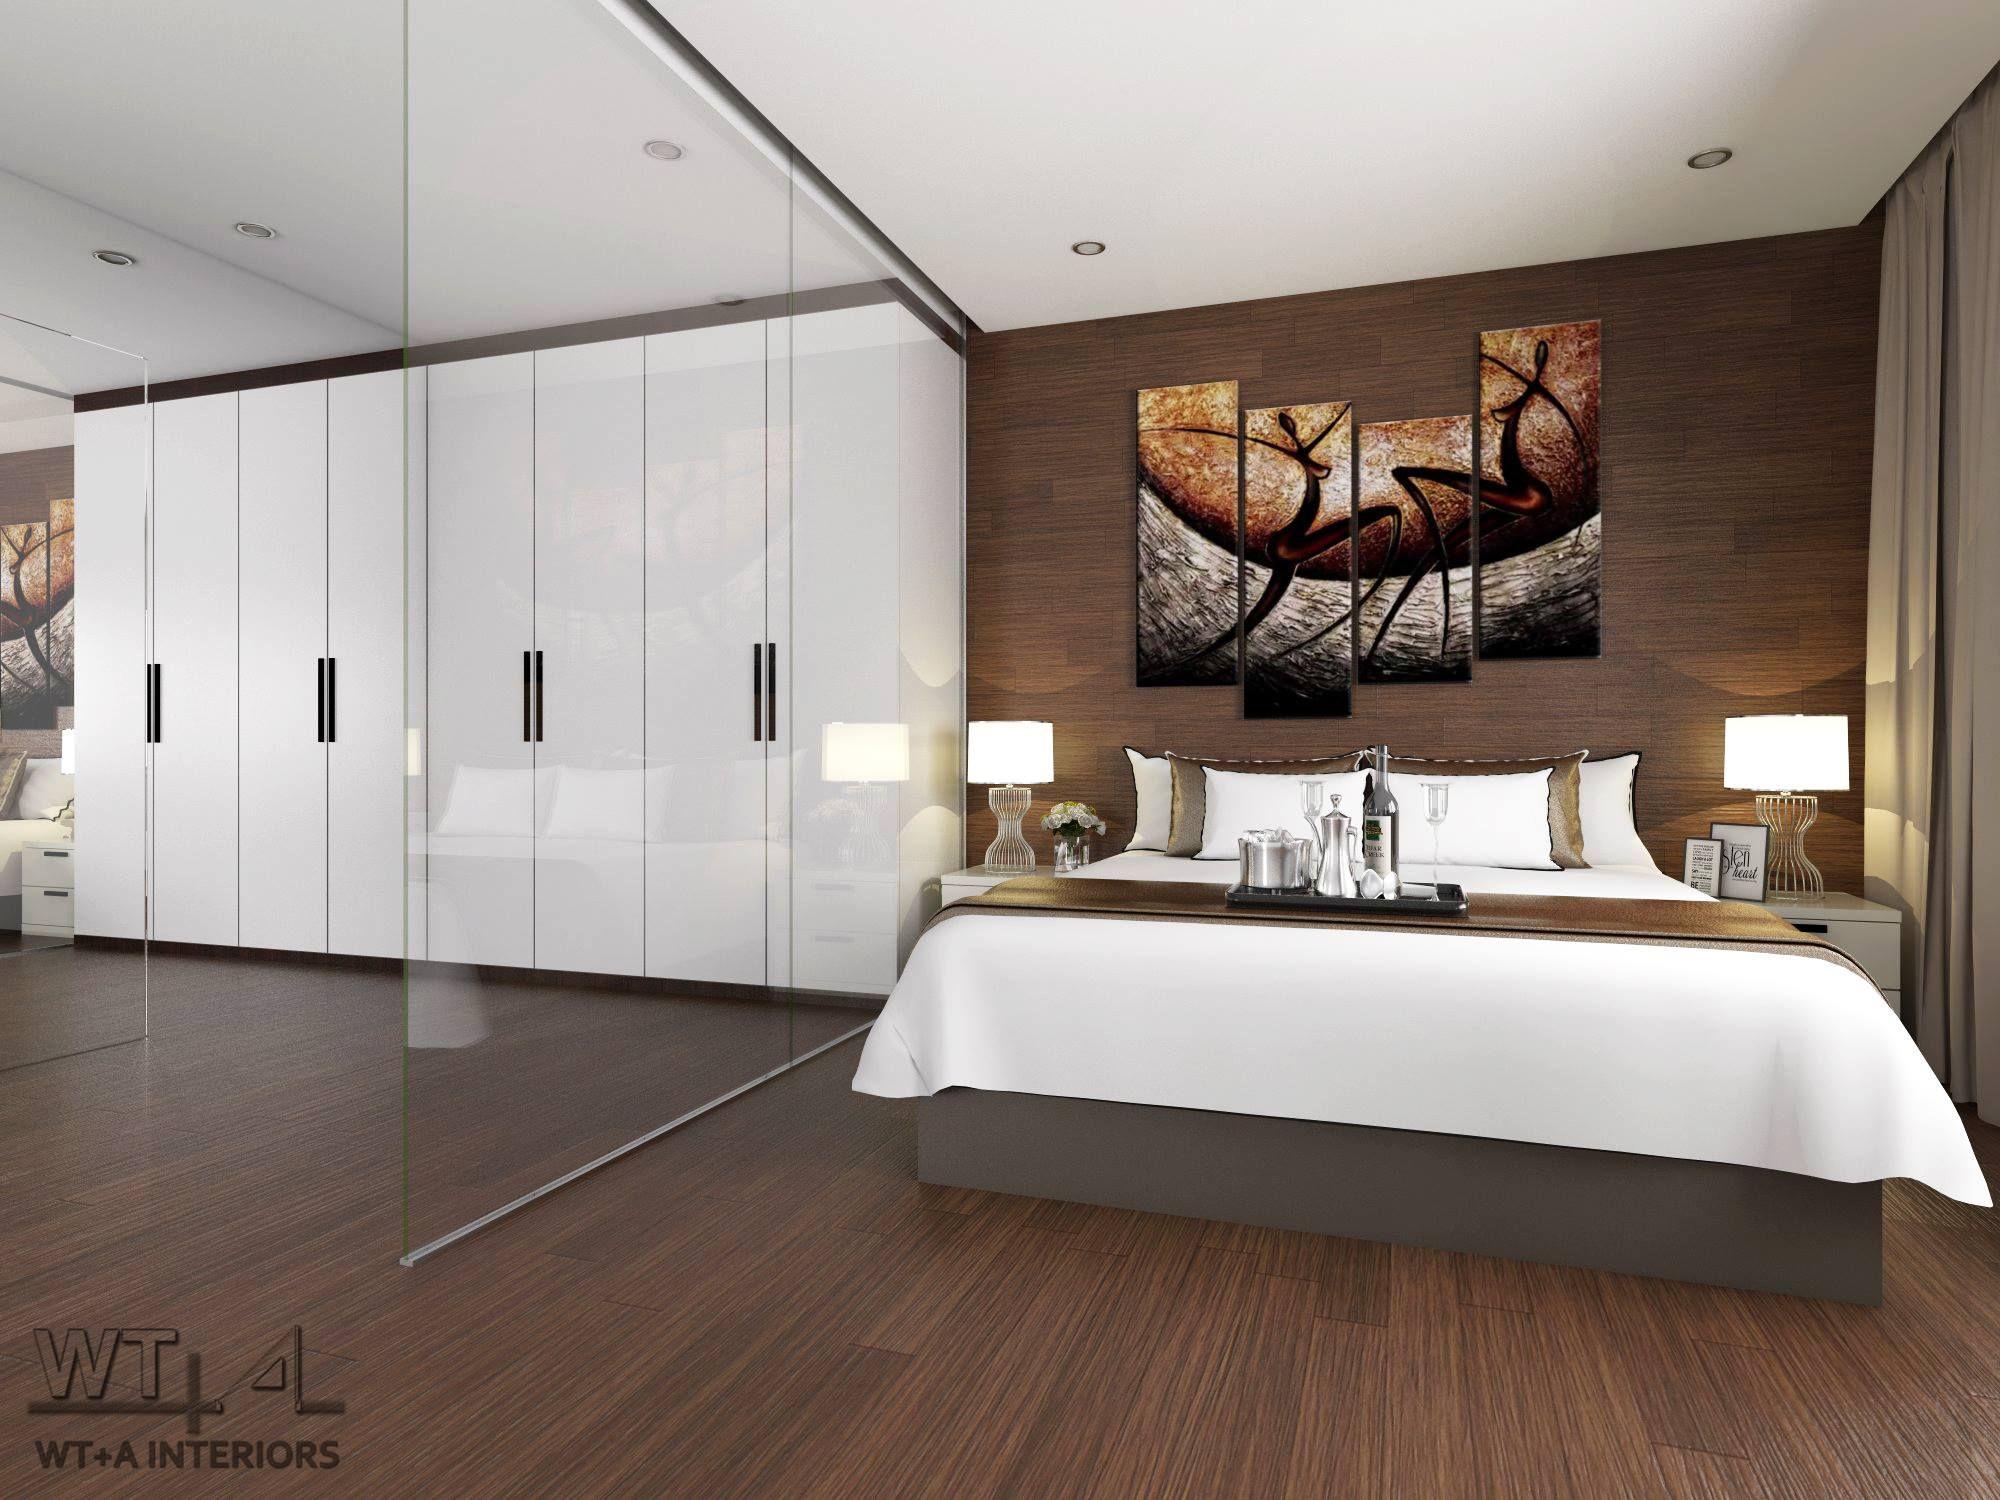 Minimalist Concept By Wt A Interiors Login To Renopedia Com Sg